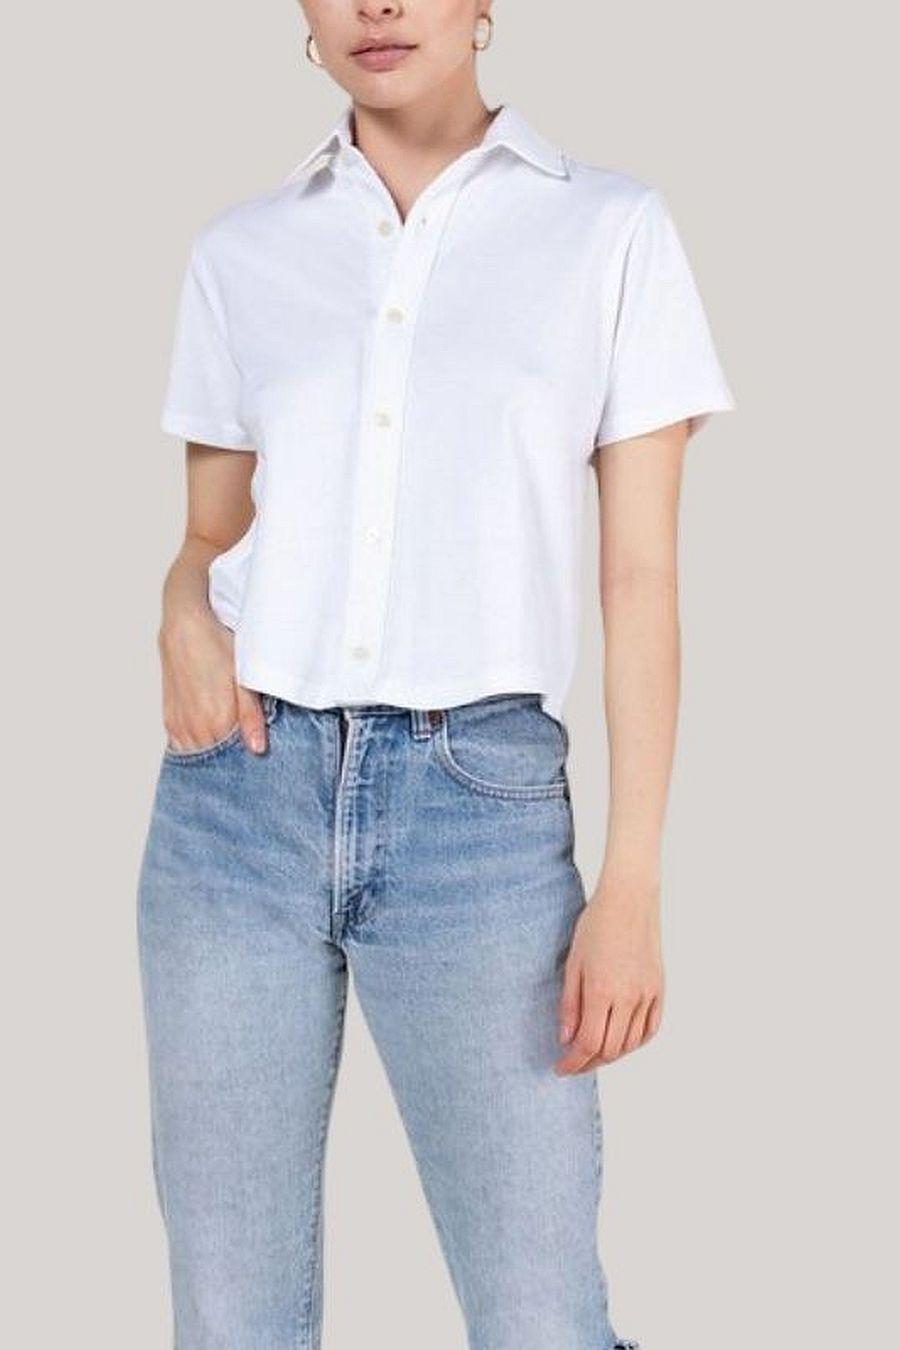 Leset Short Sleeve Button Down - White